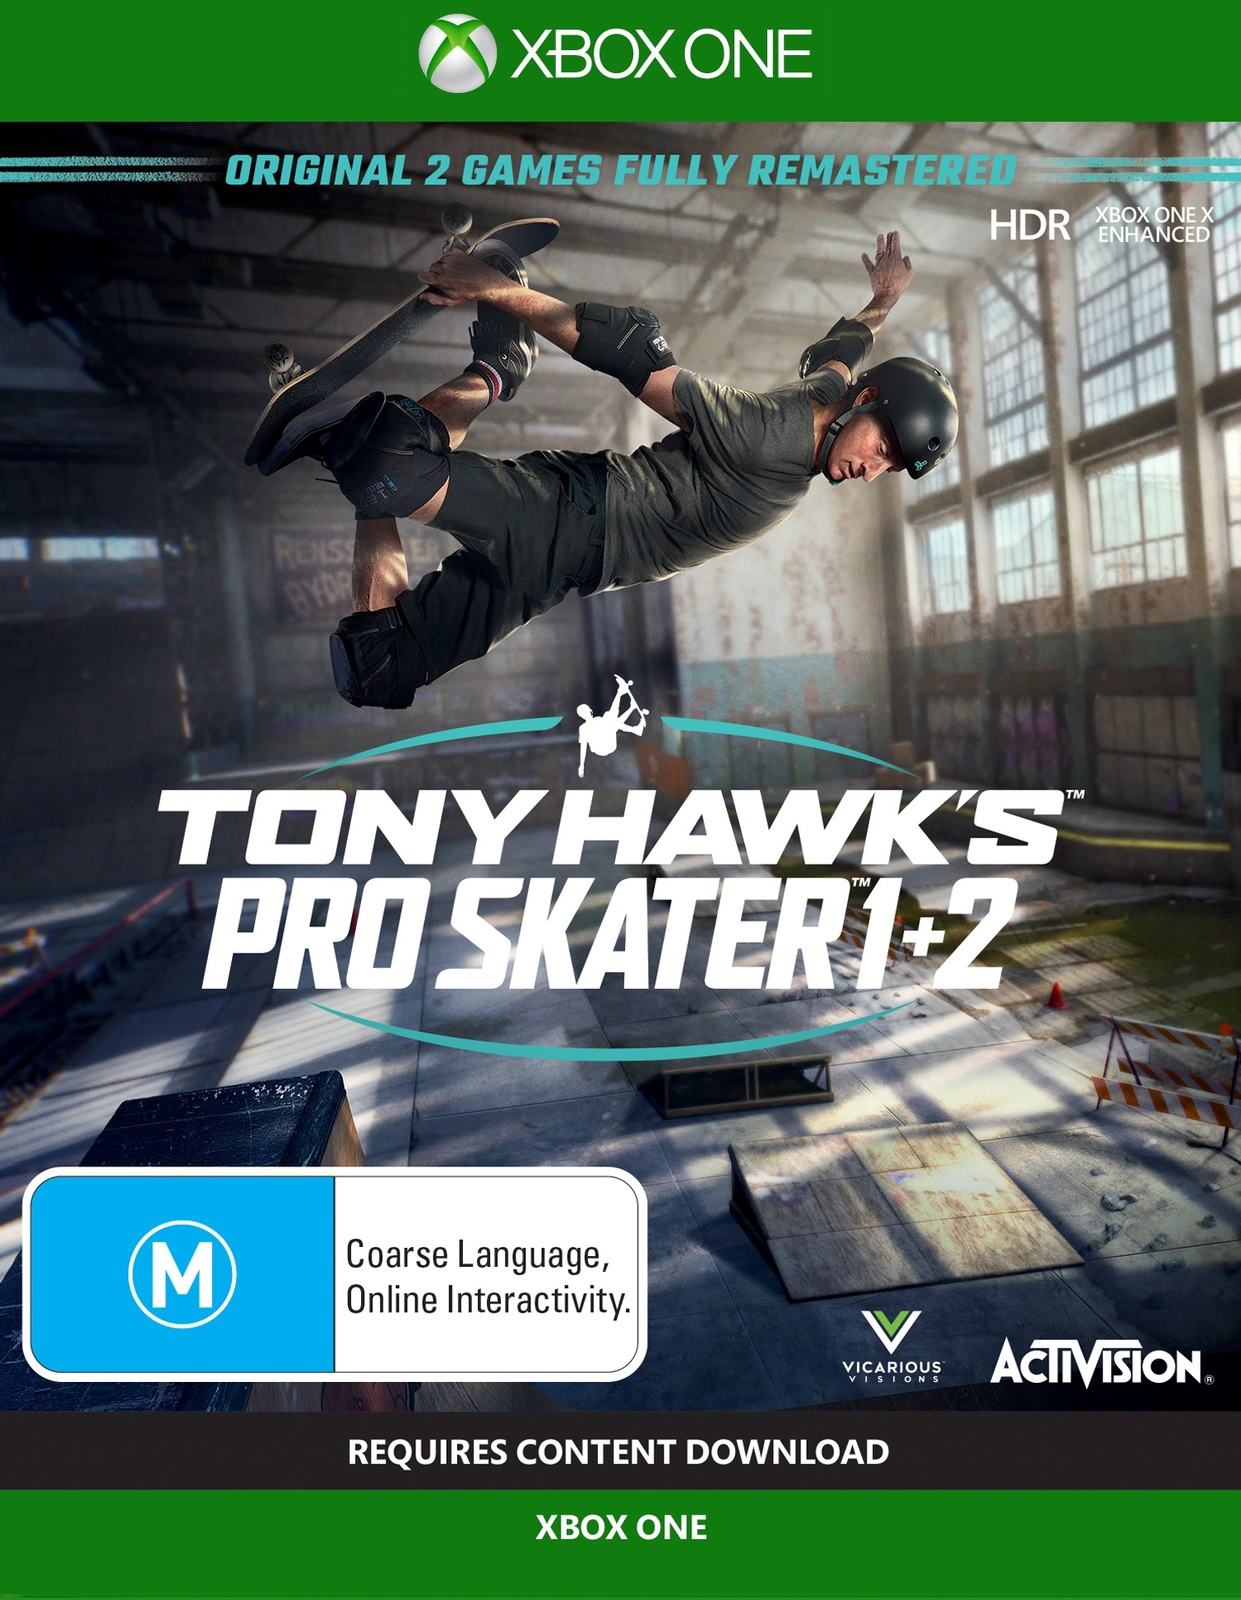 Tony Hawk's Pro Skater 1 & 2 screenshot